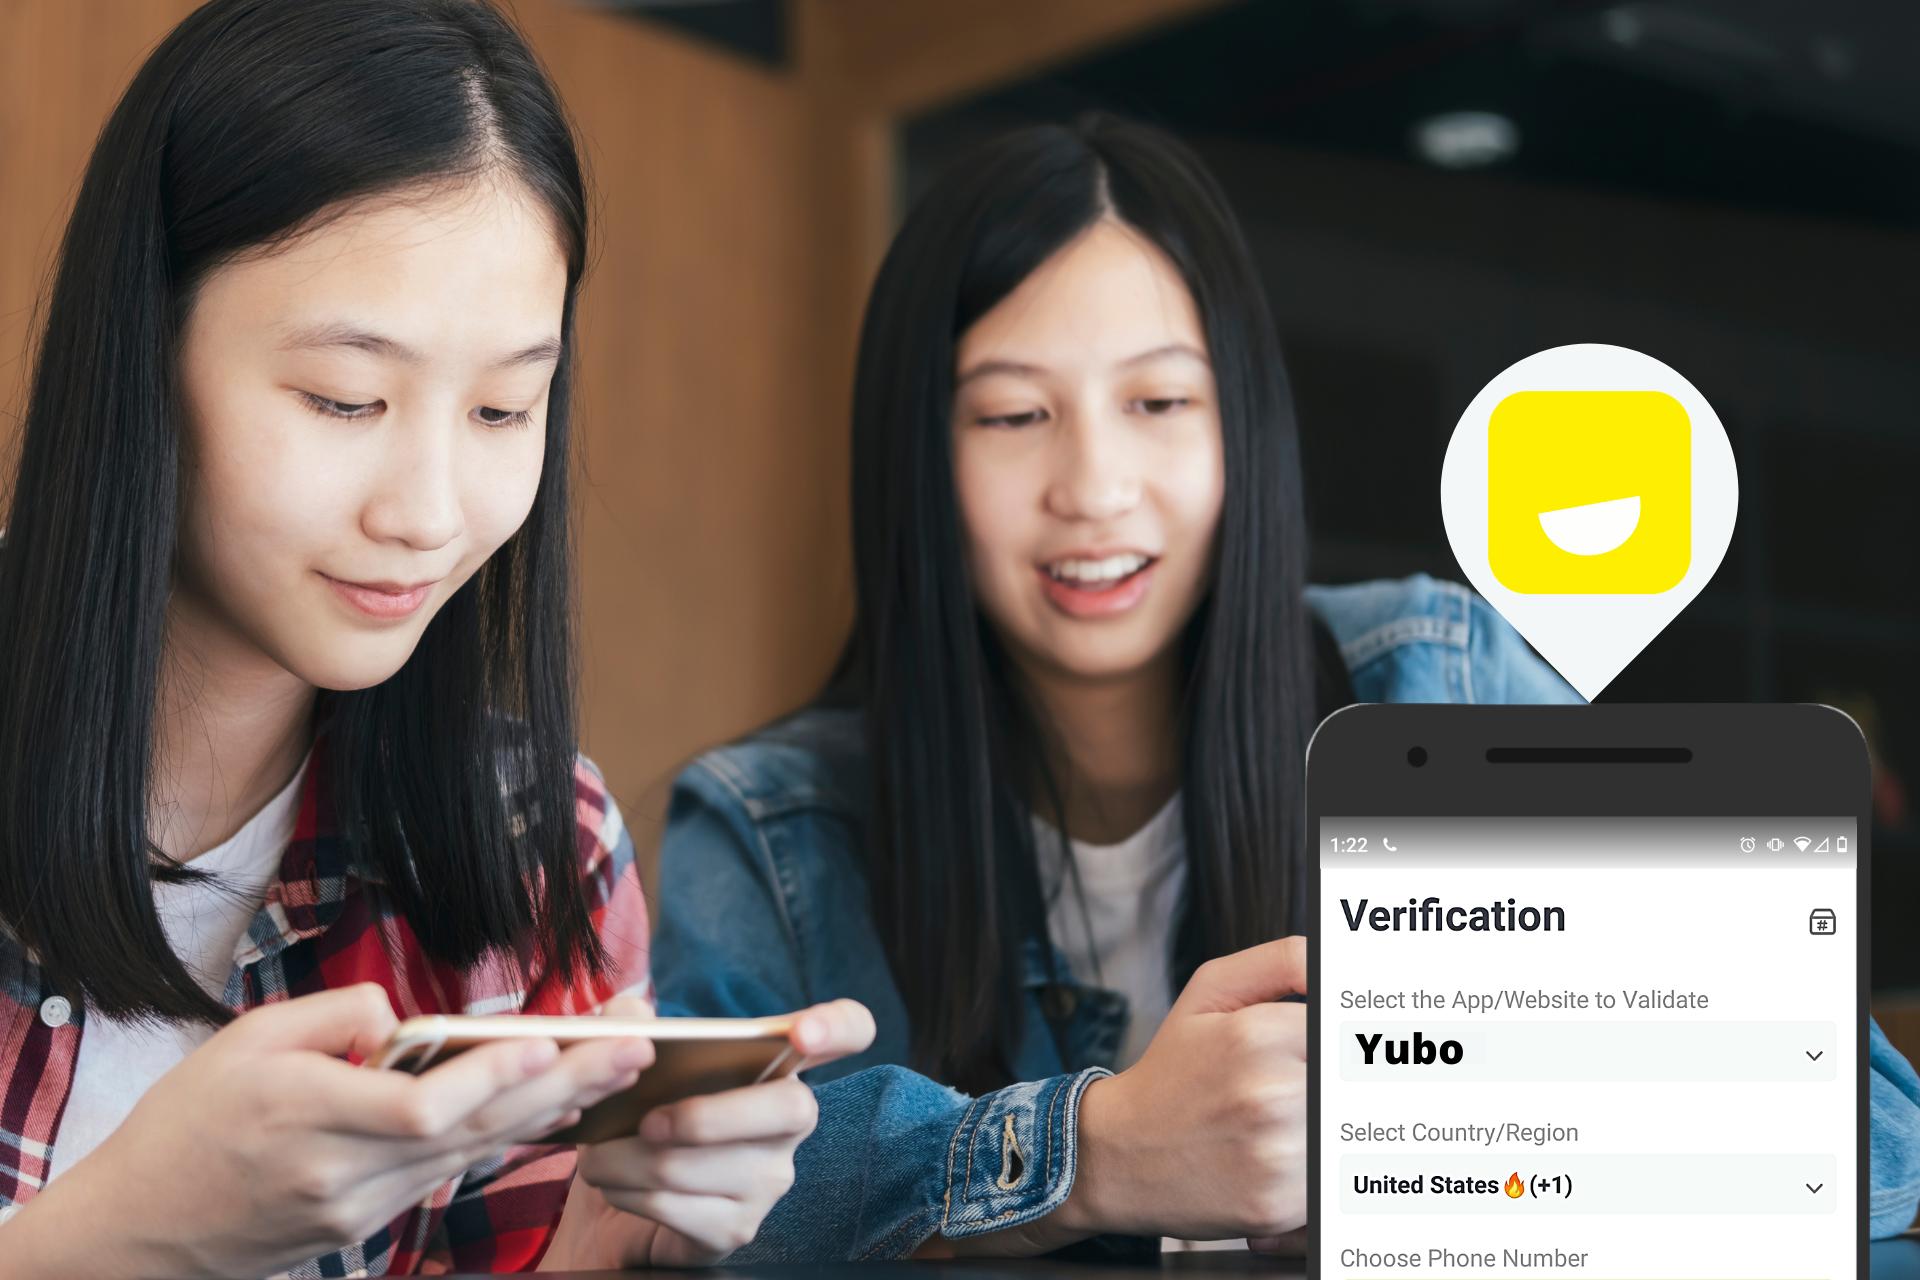 Bypassing SMS verification Yubo